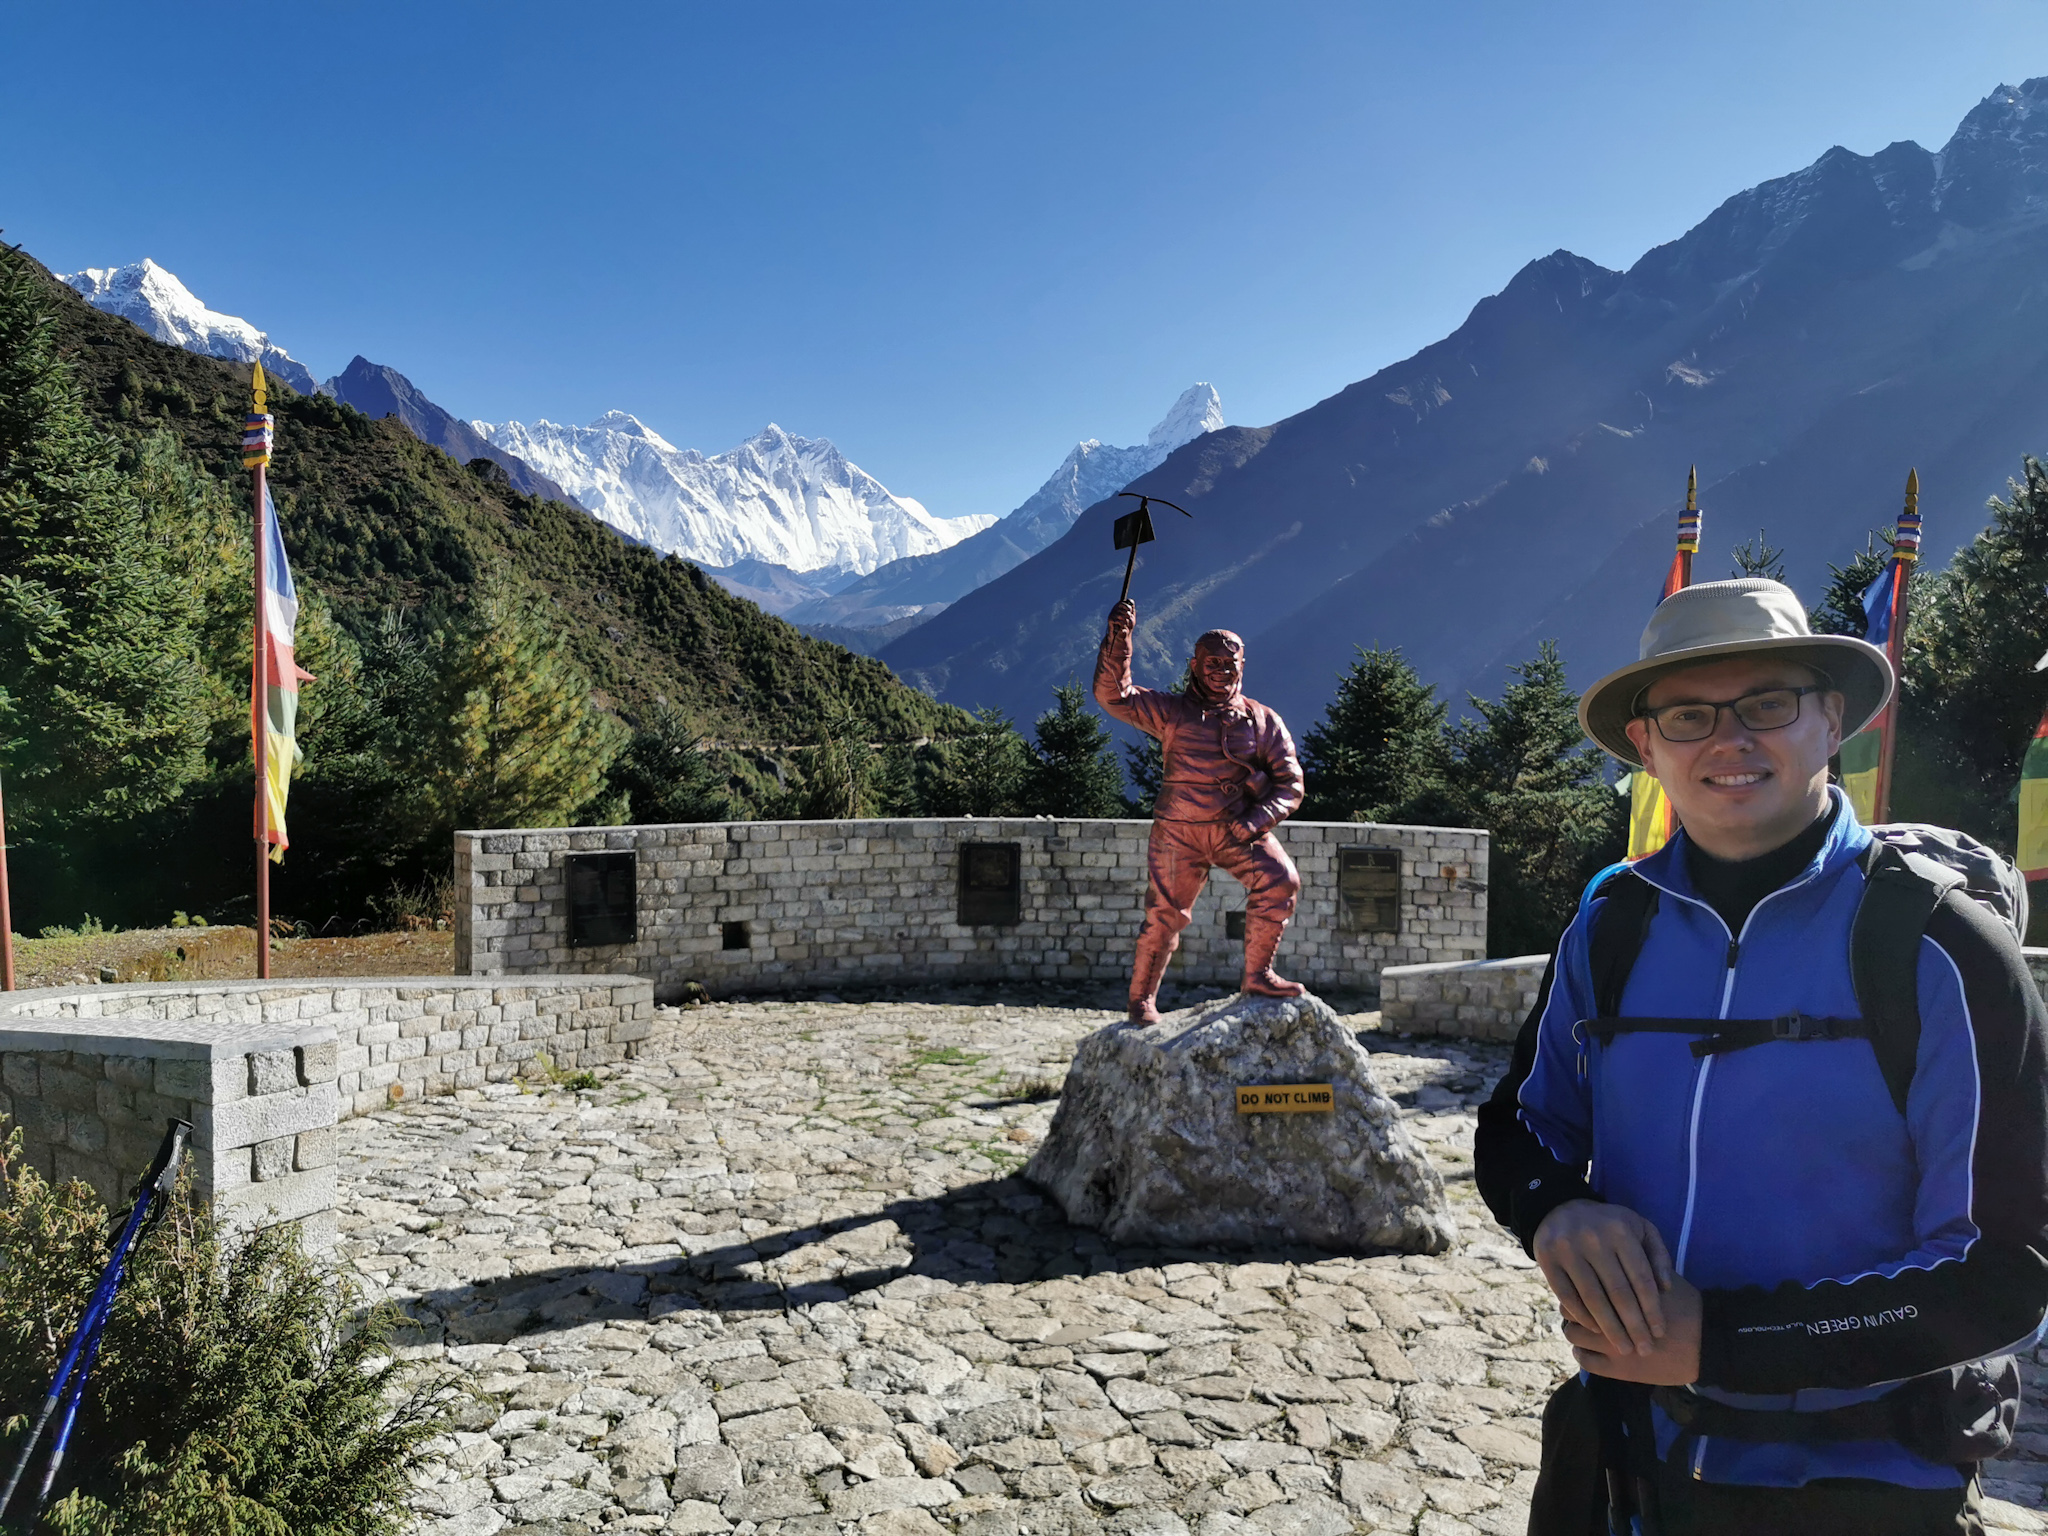 Mount Everest at sight